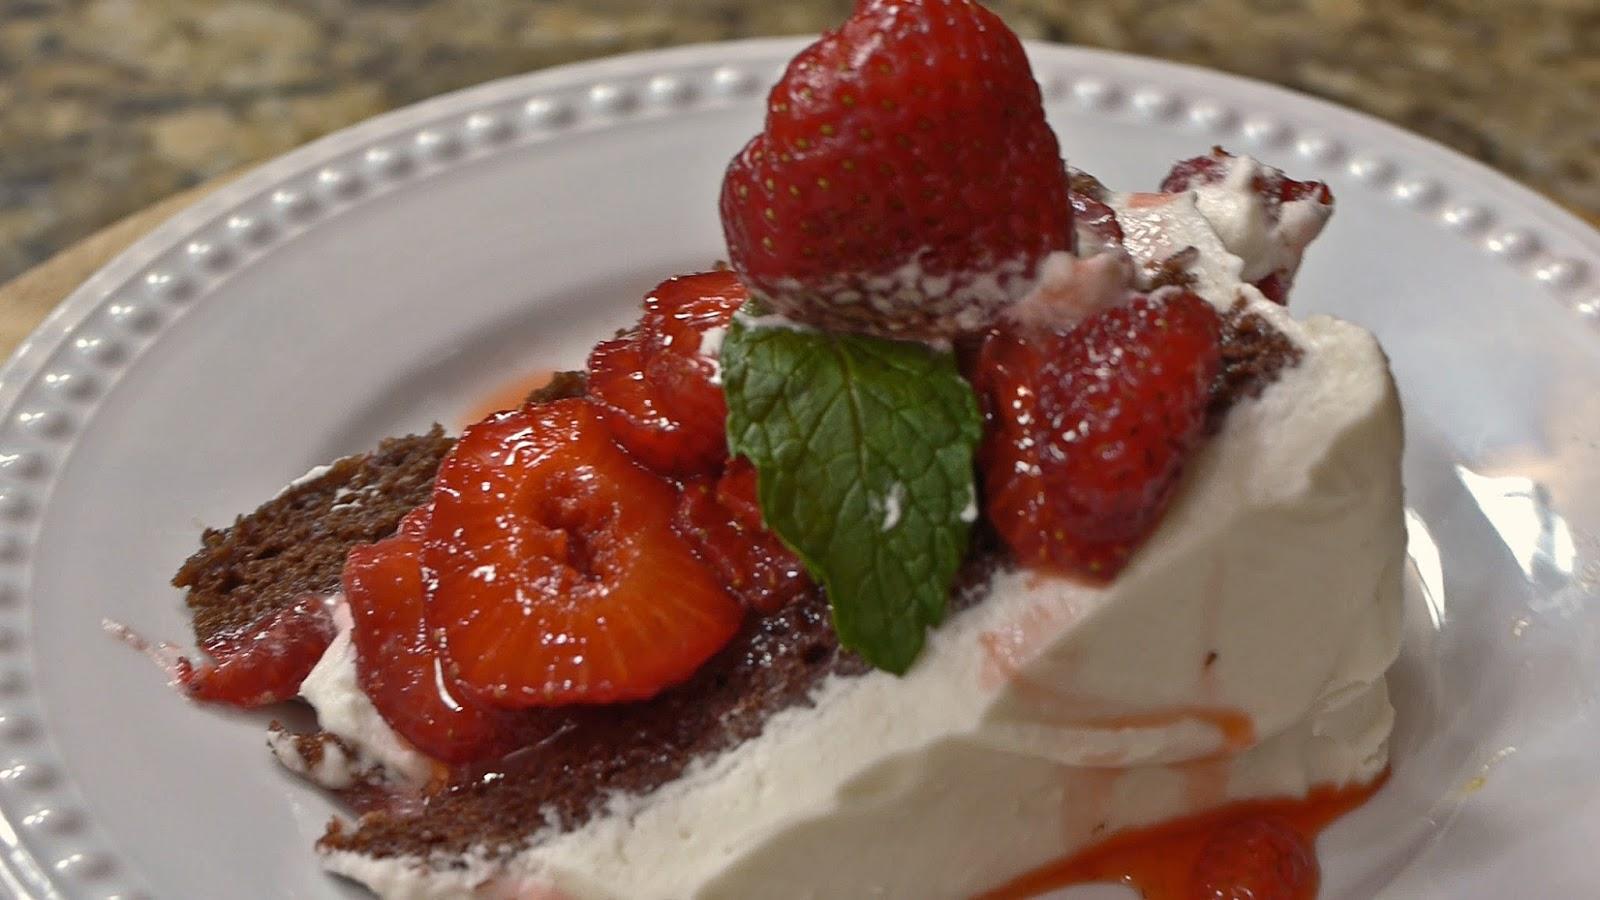 Strawberry Wacky Cake